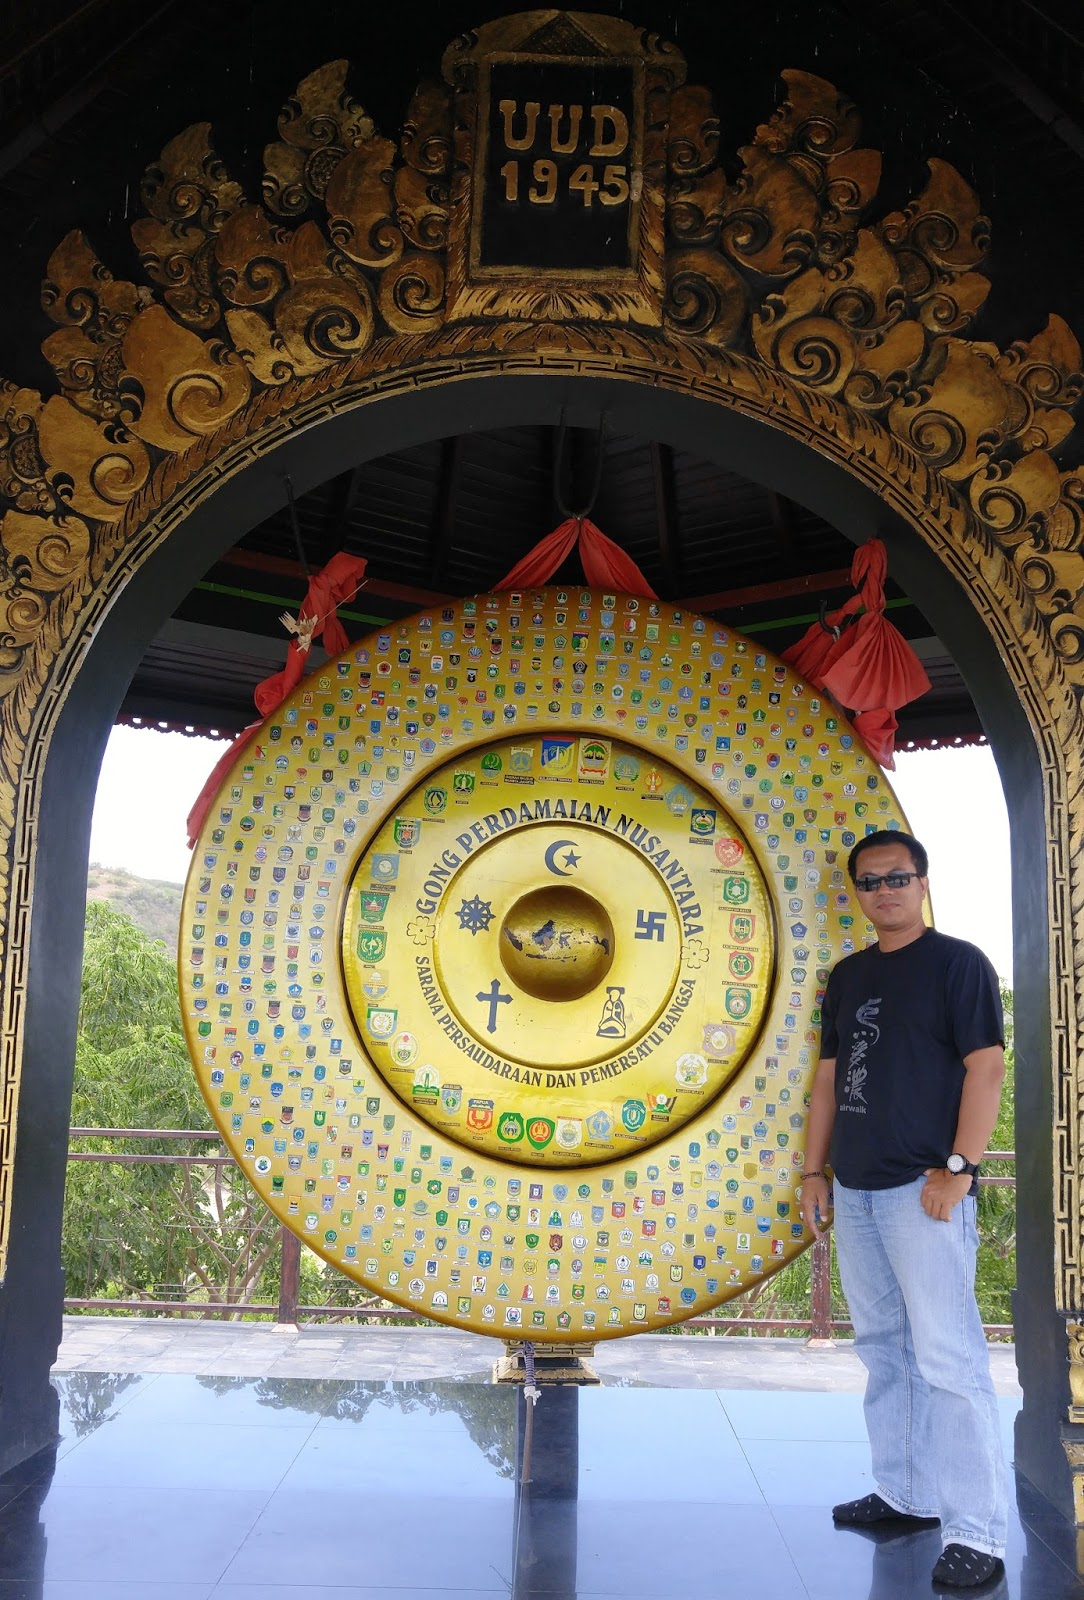 Wiyak Bumi Langit Gong Perdamaian Nusantara Monumen Satu Lokasi Tidak